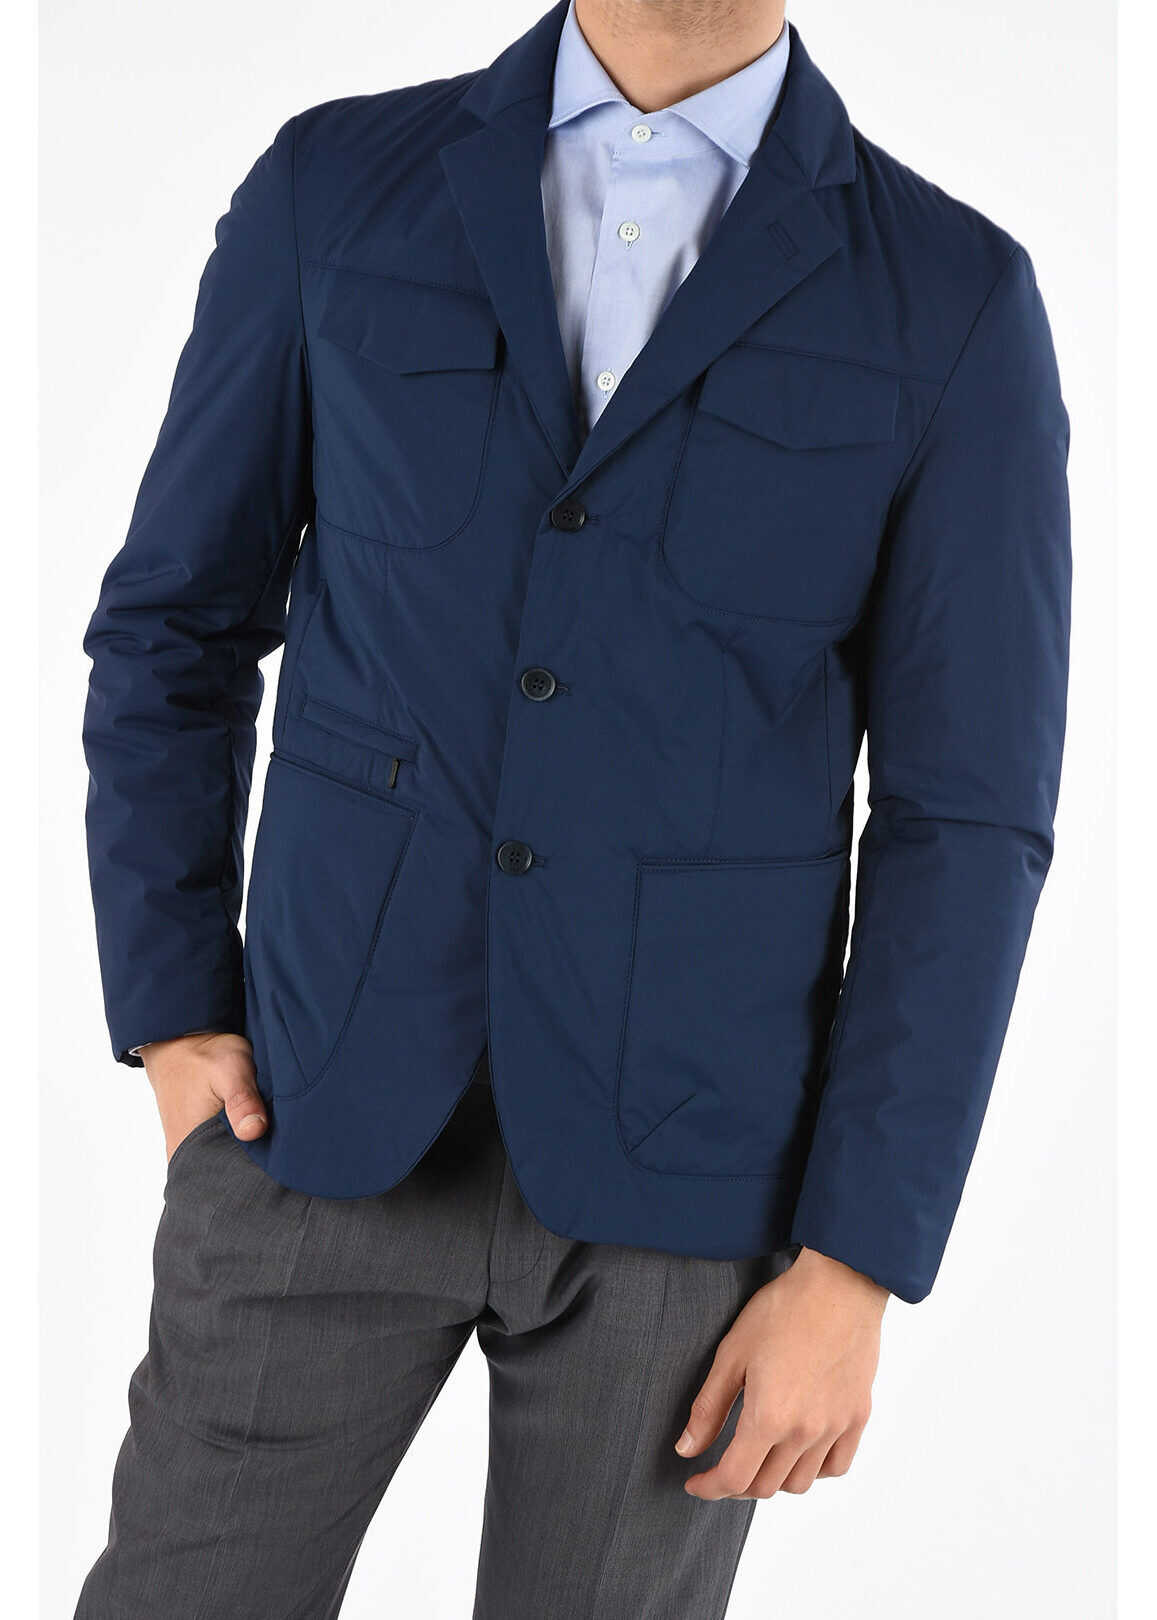 CORNELIANI CC COLLECTION FIELD padded blazer BLUE imagine